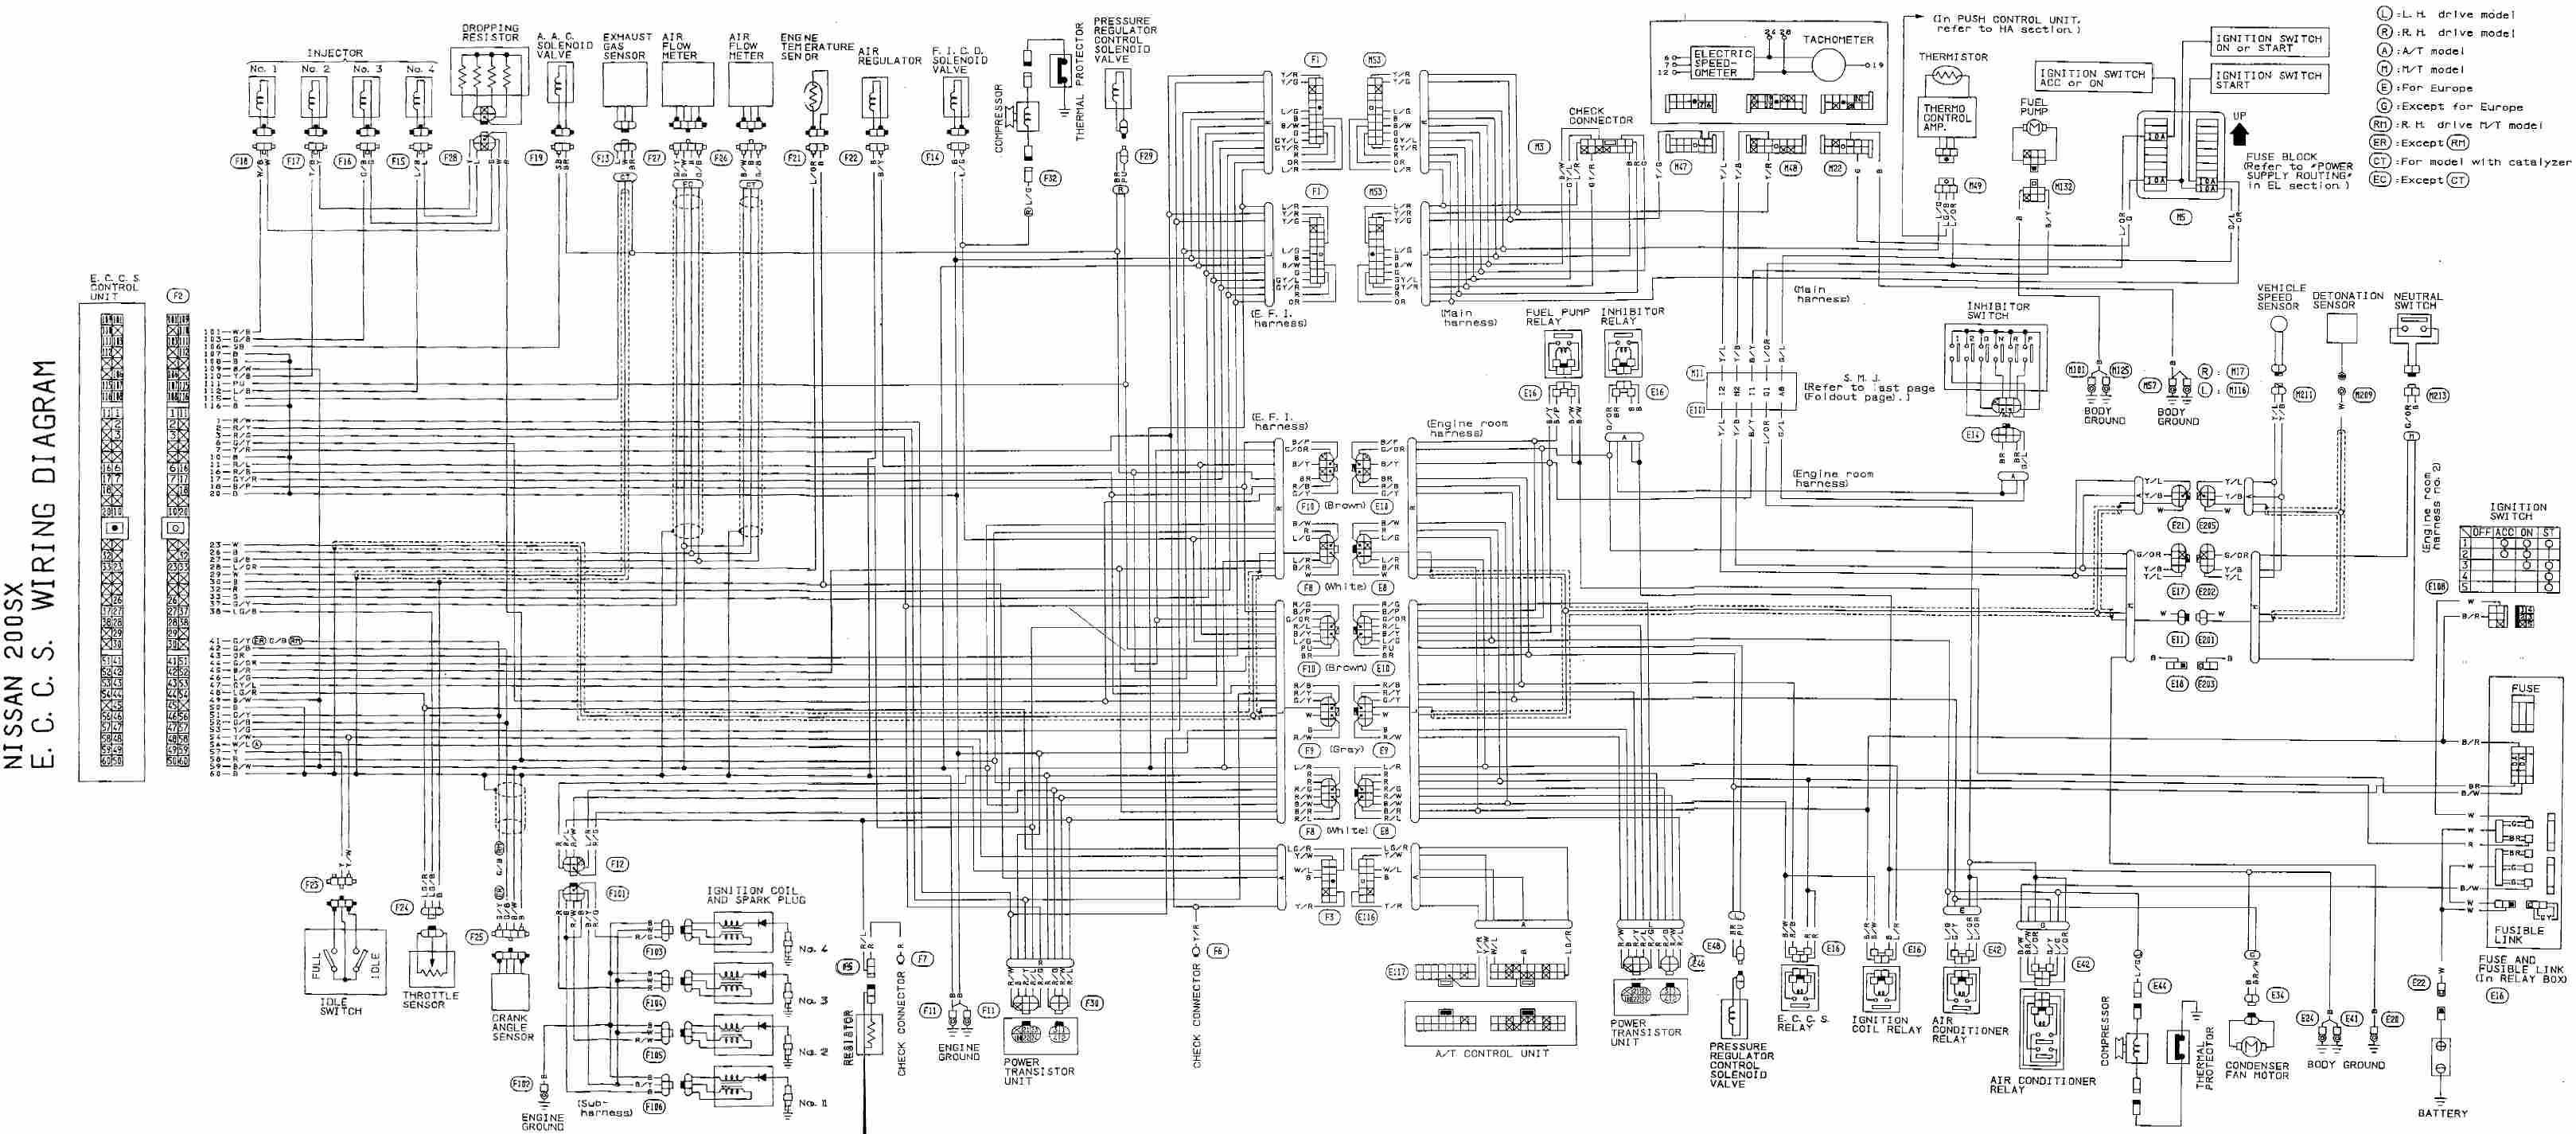 Wiring Diagram Nissan Zd30 - House Wiring Diagram Symbols • on nissan sentra radio wiring, nissan 300zx wiring-diagram, nissan hardbody wiring-diagram, nissan repair diagrams, nissan titan wiring-diagram, nissan wiring schematics, nissan 240sx wiring harness, toyota highlander fuse diagram, nissan timing chain diagram, dodge nitro external diagram, 1998 nissan maxima fuel diagram, nissan dash diagram, 1997 nissan maxima diagram, nissan titan radio wiring, nissan wiring color codes, nissan schematic diagram, nissan battery diagram, nissan radio wire, nissan brakes diagram, nissan fuse diagram,